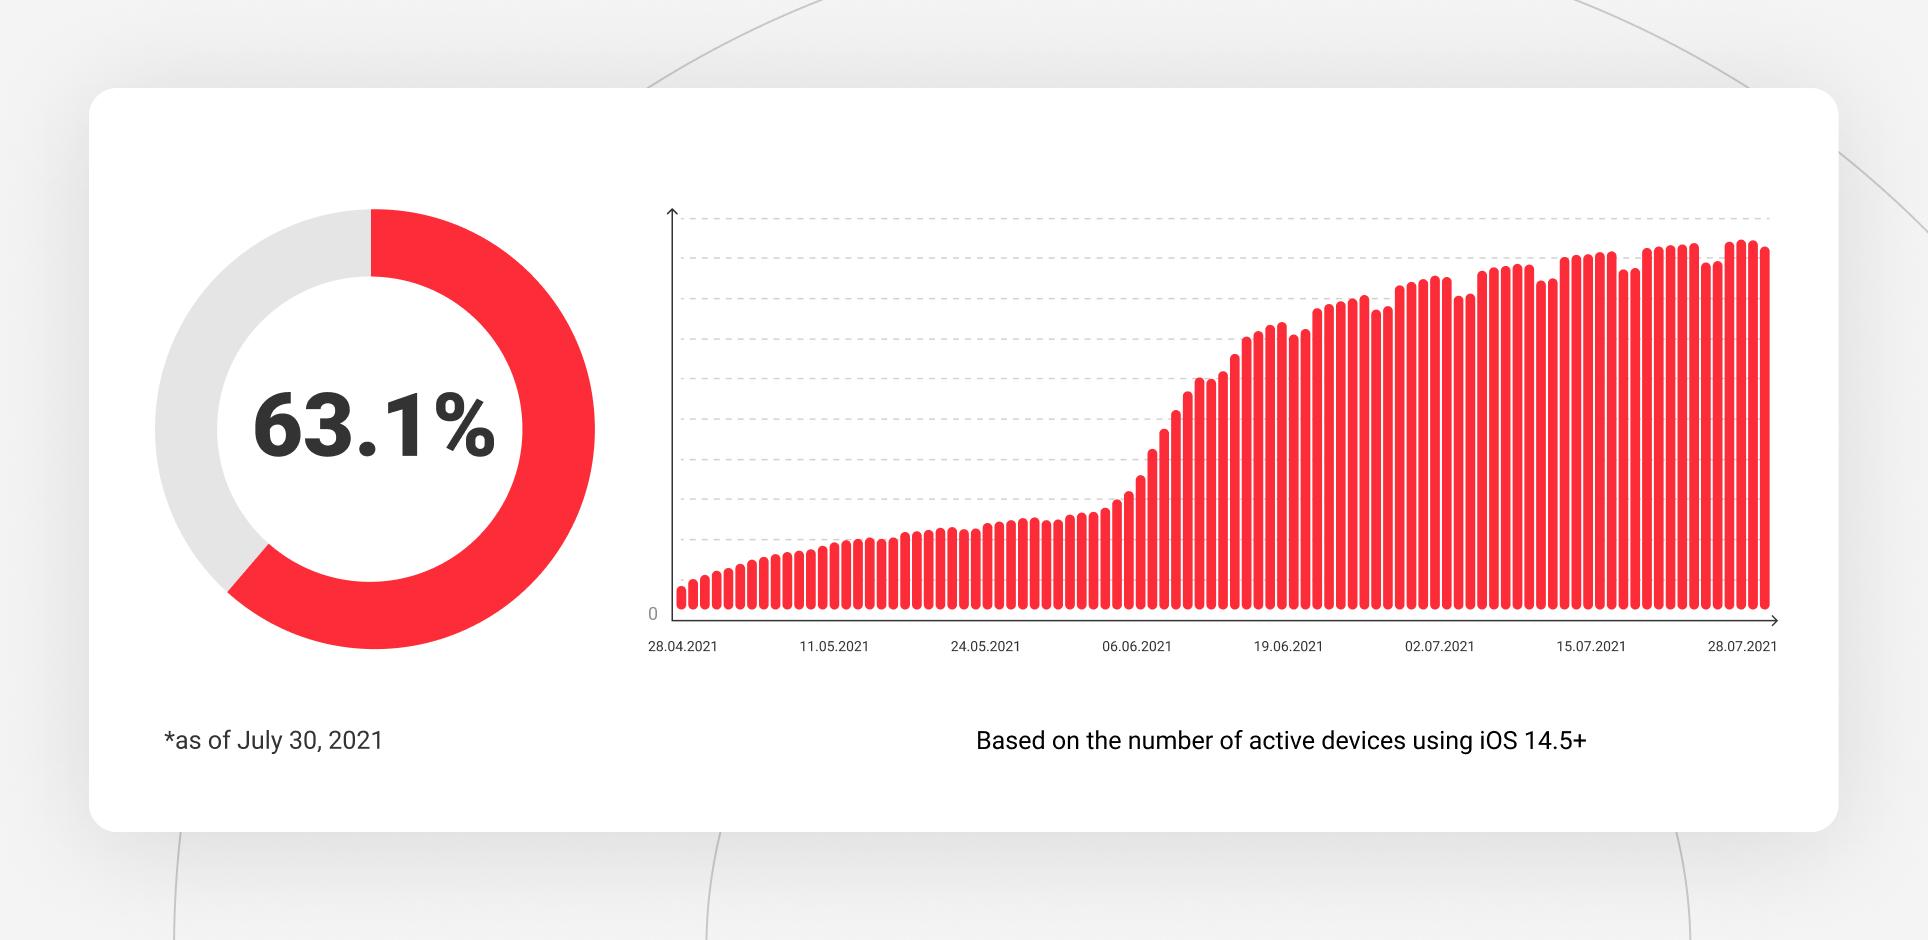 iOS 14.5+ adoption rate globally